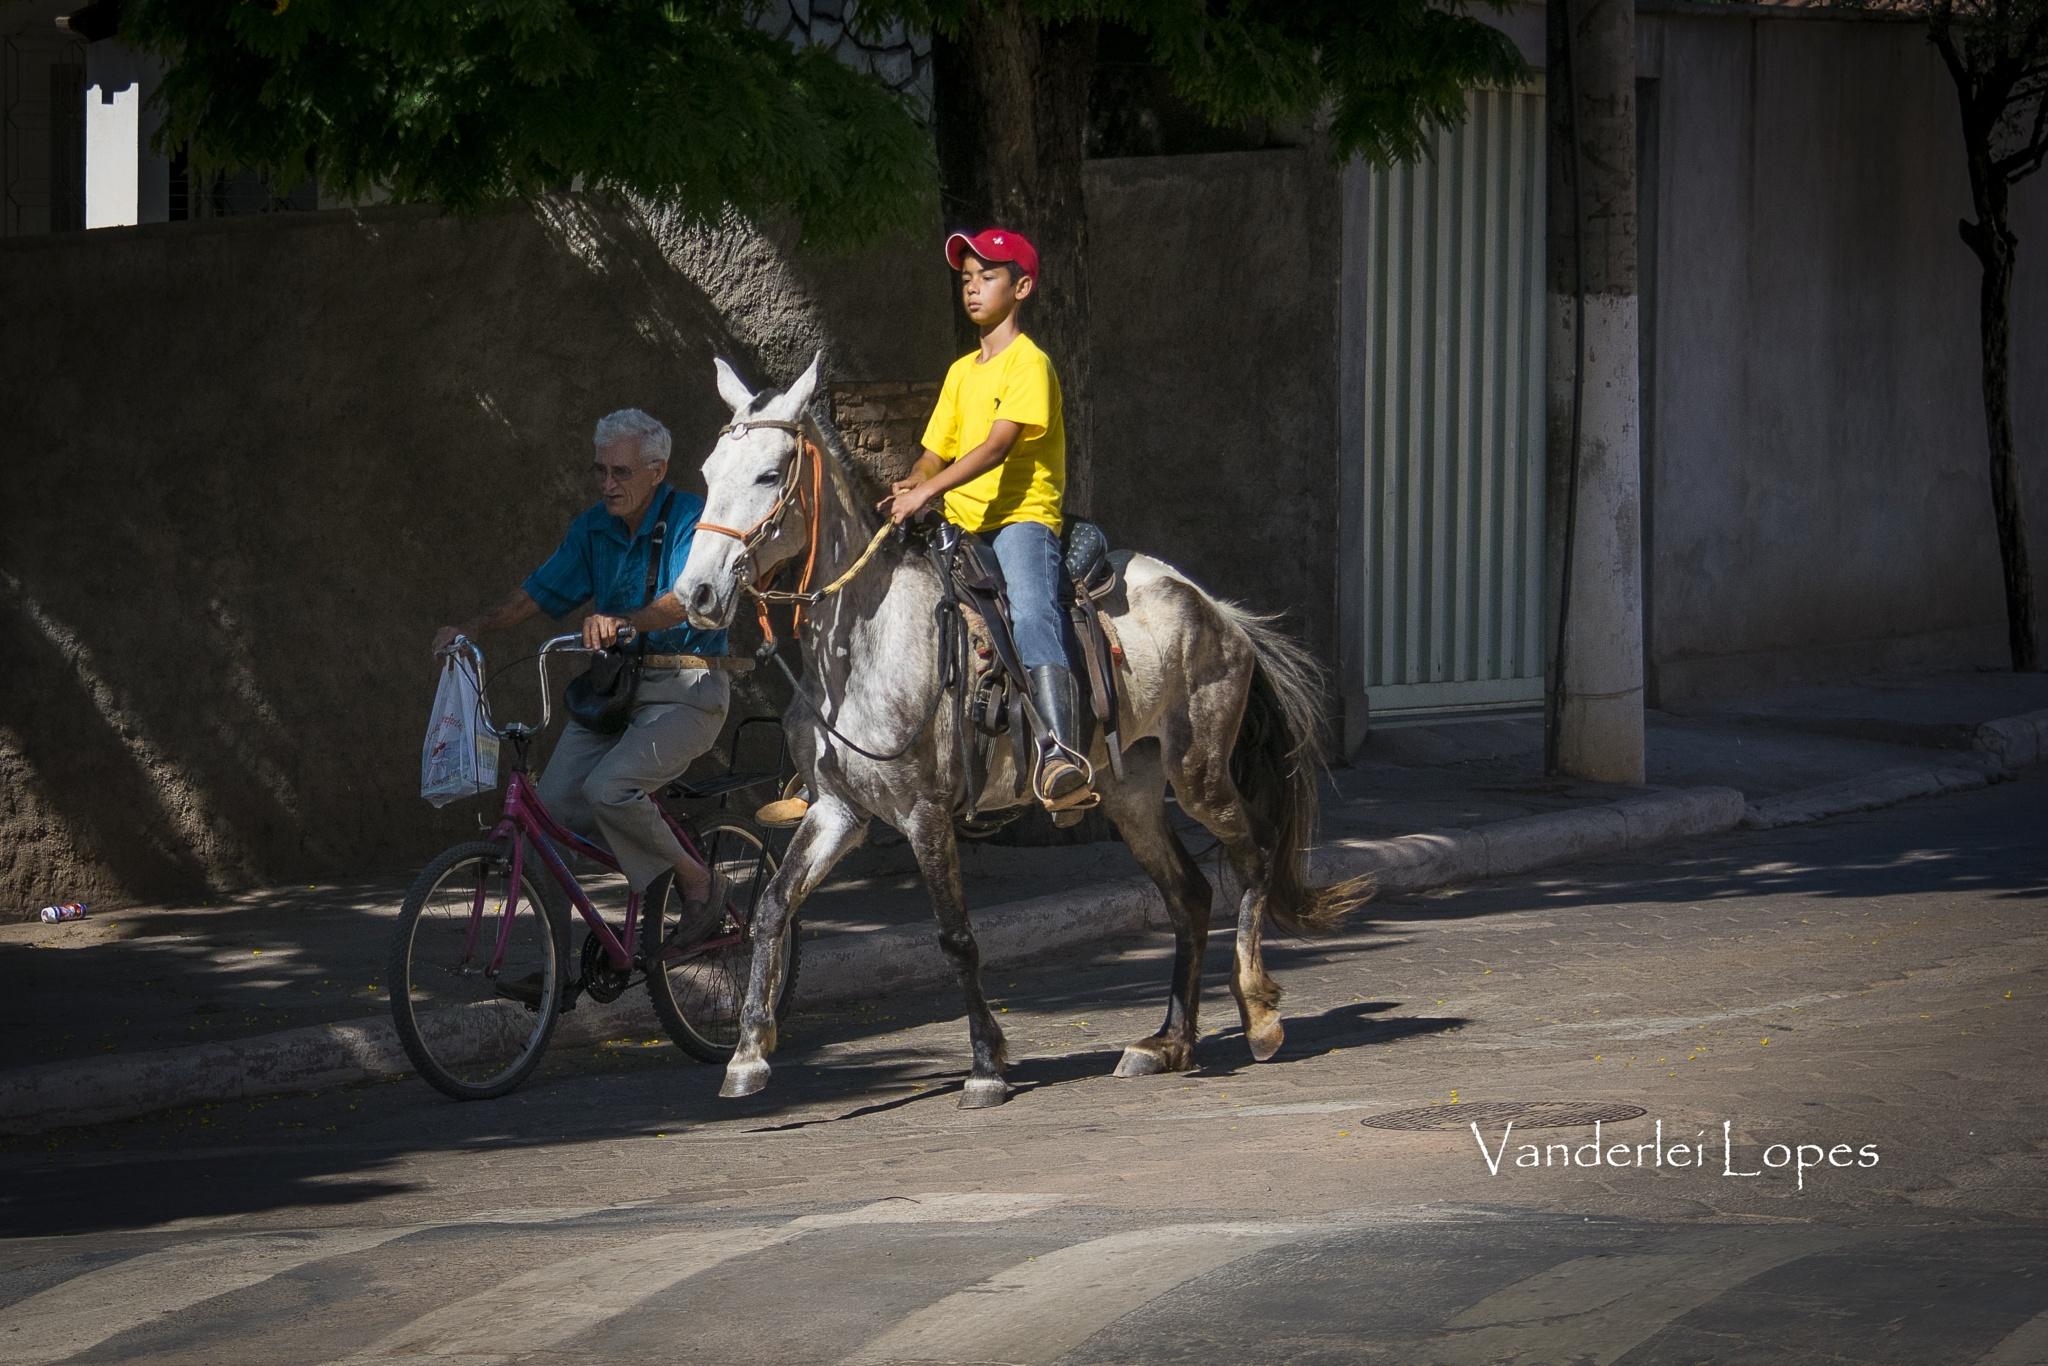 Meios de transporte. by Vanderlei Lopes